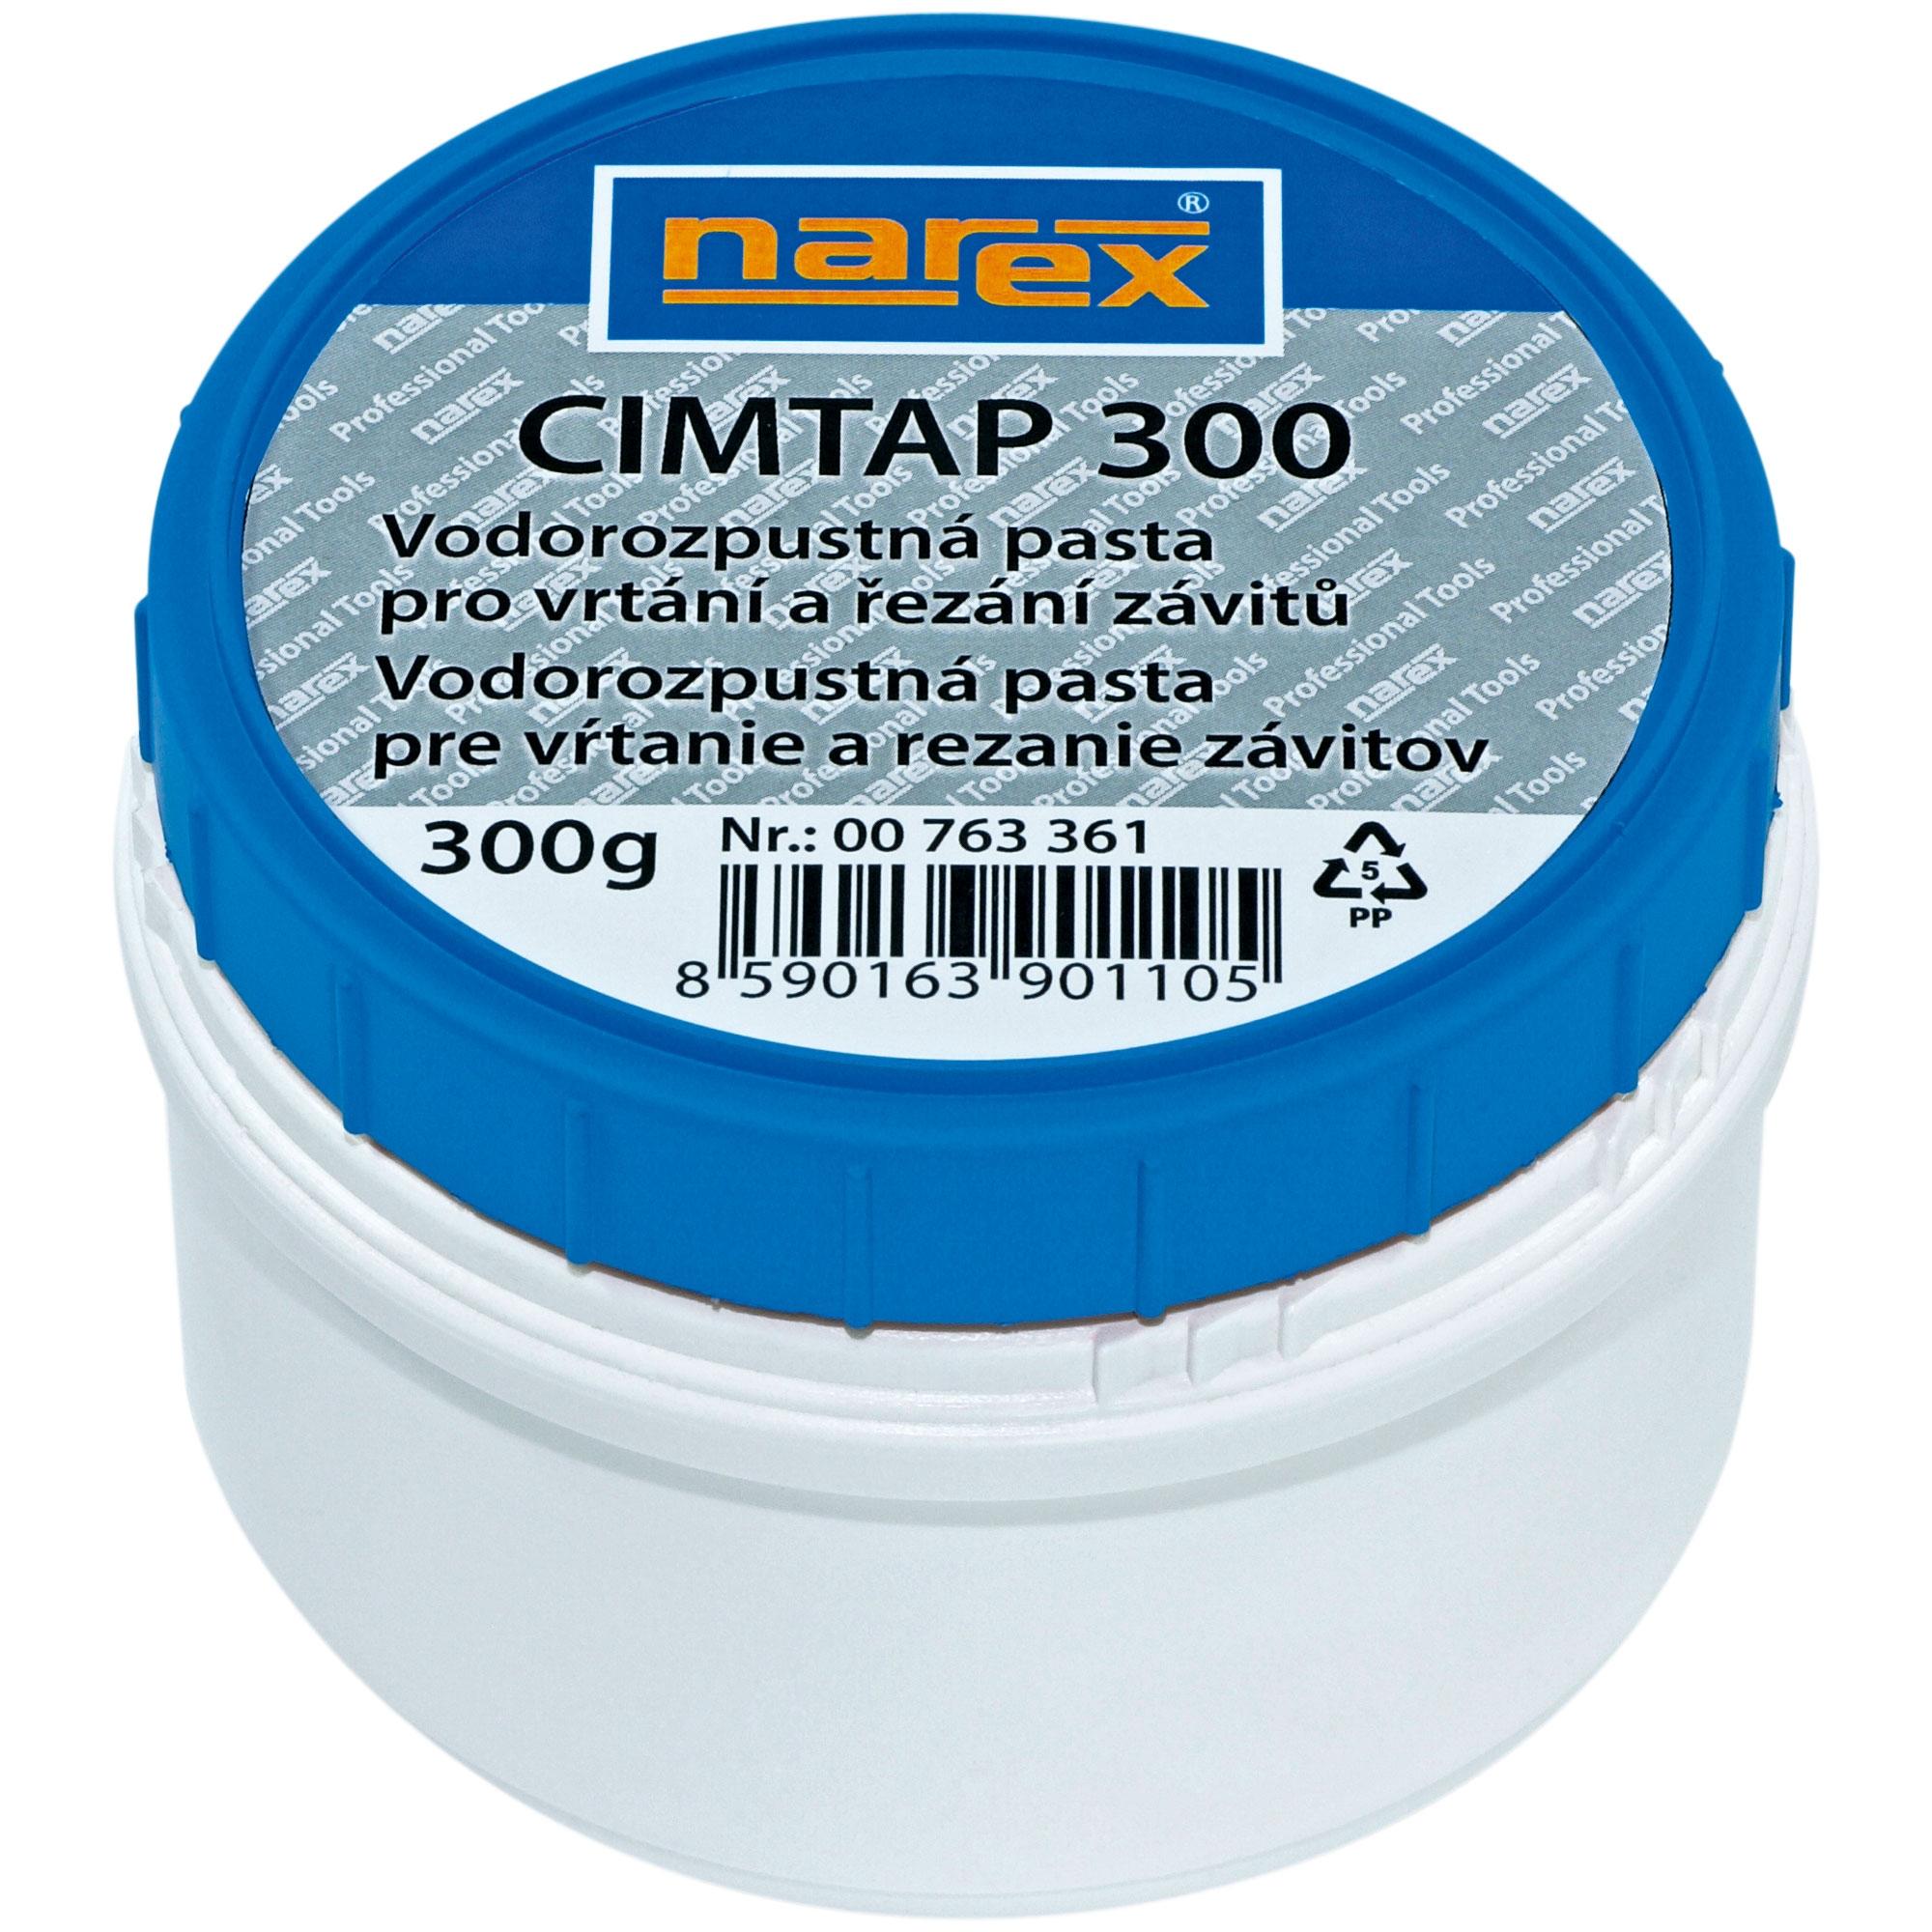 Narex CIMTAP 300 - Rezacia...